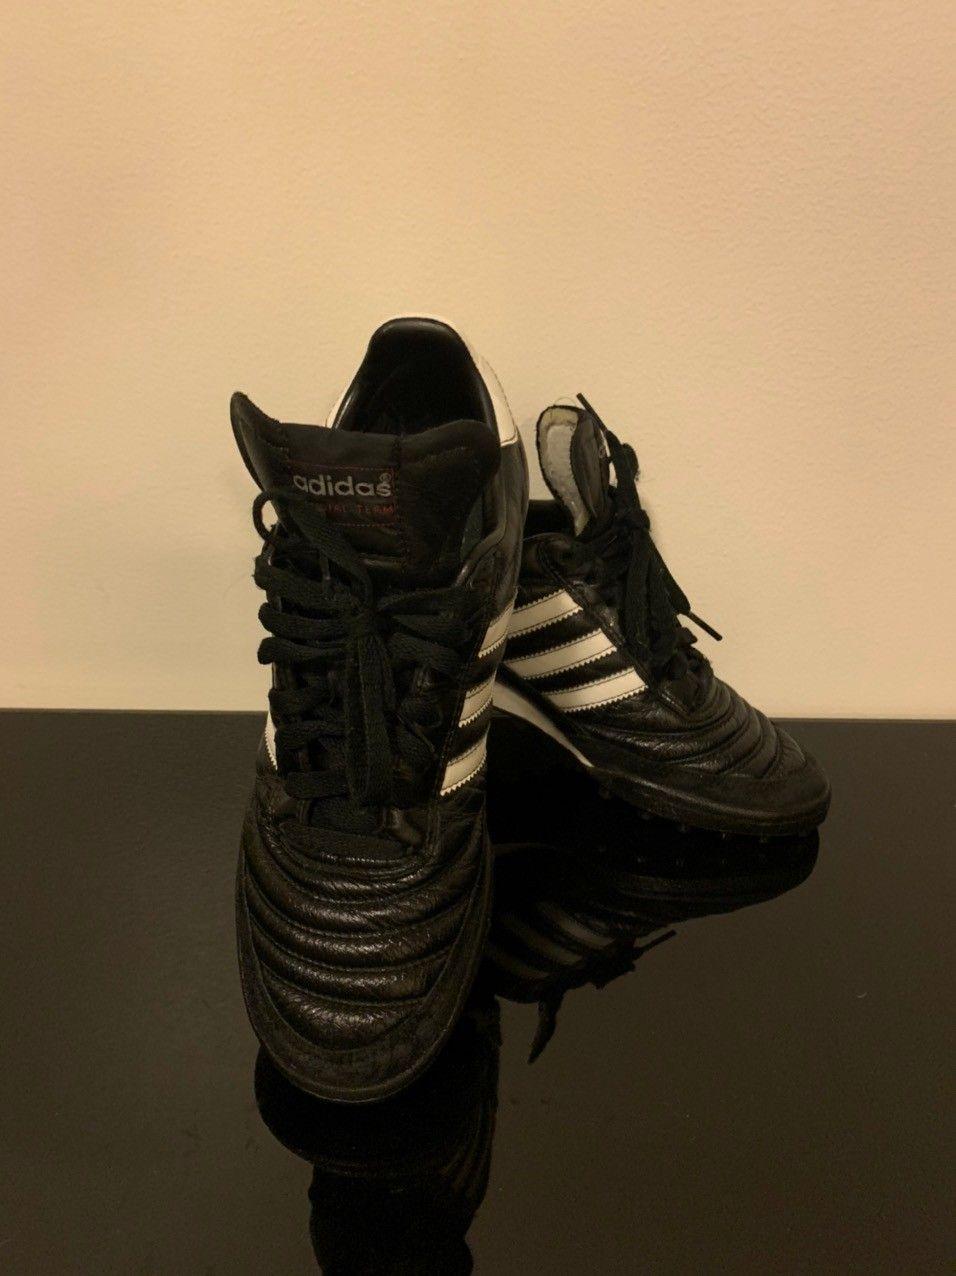 Adidas Mundial Team TF fotballsko str 40 i kenguruskinn